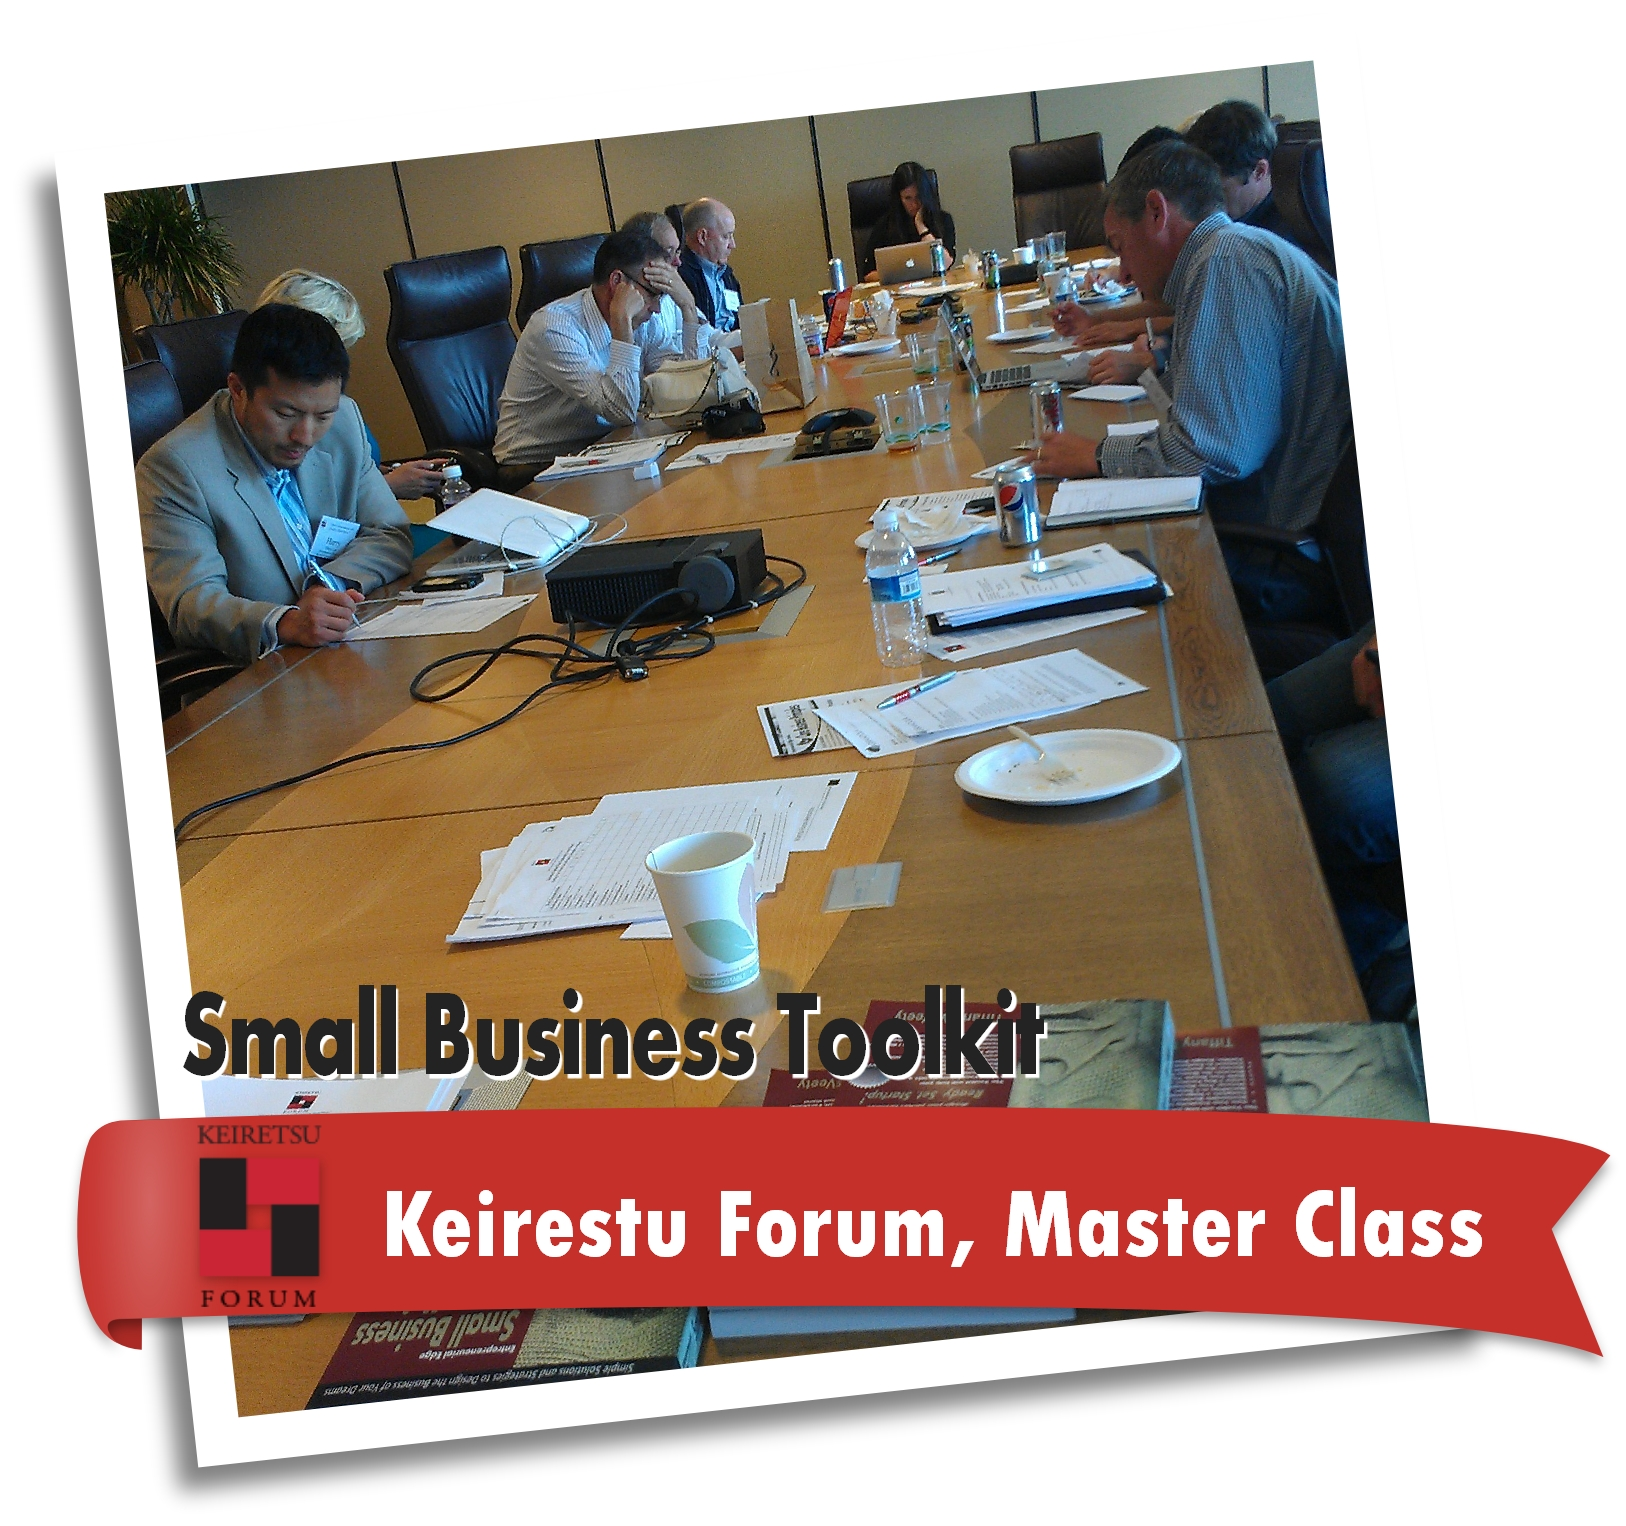 keiretsu master class.jpg